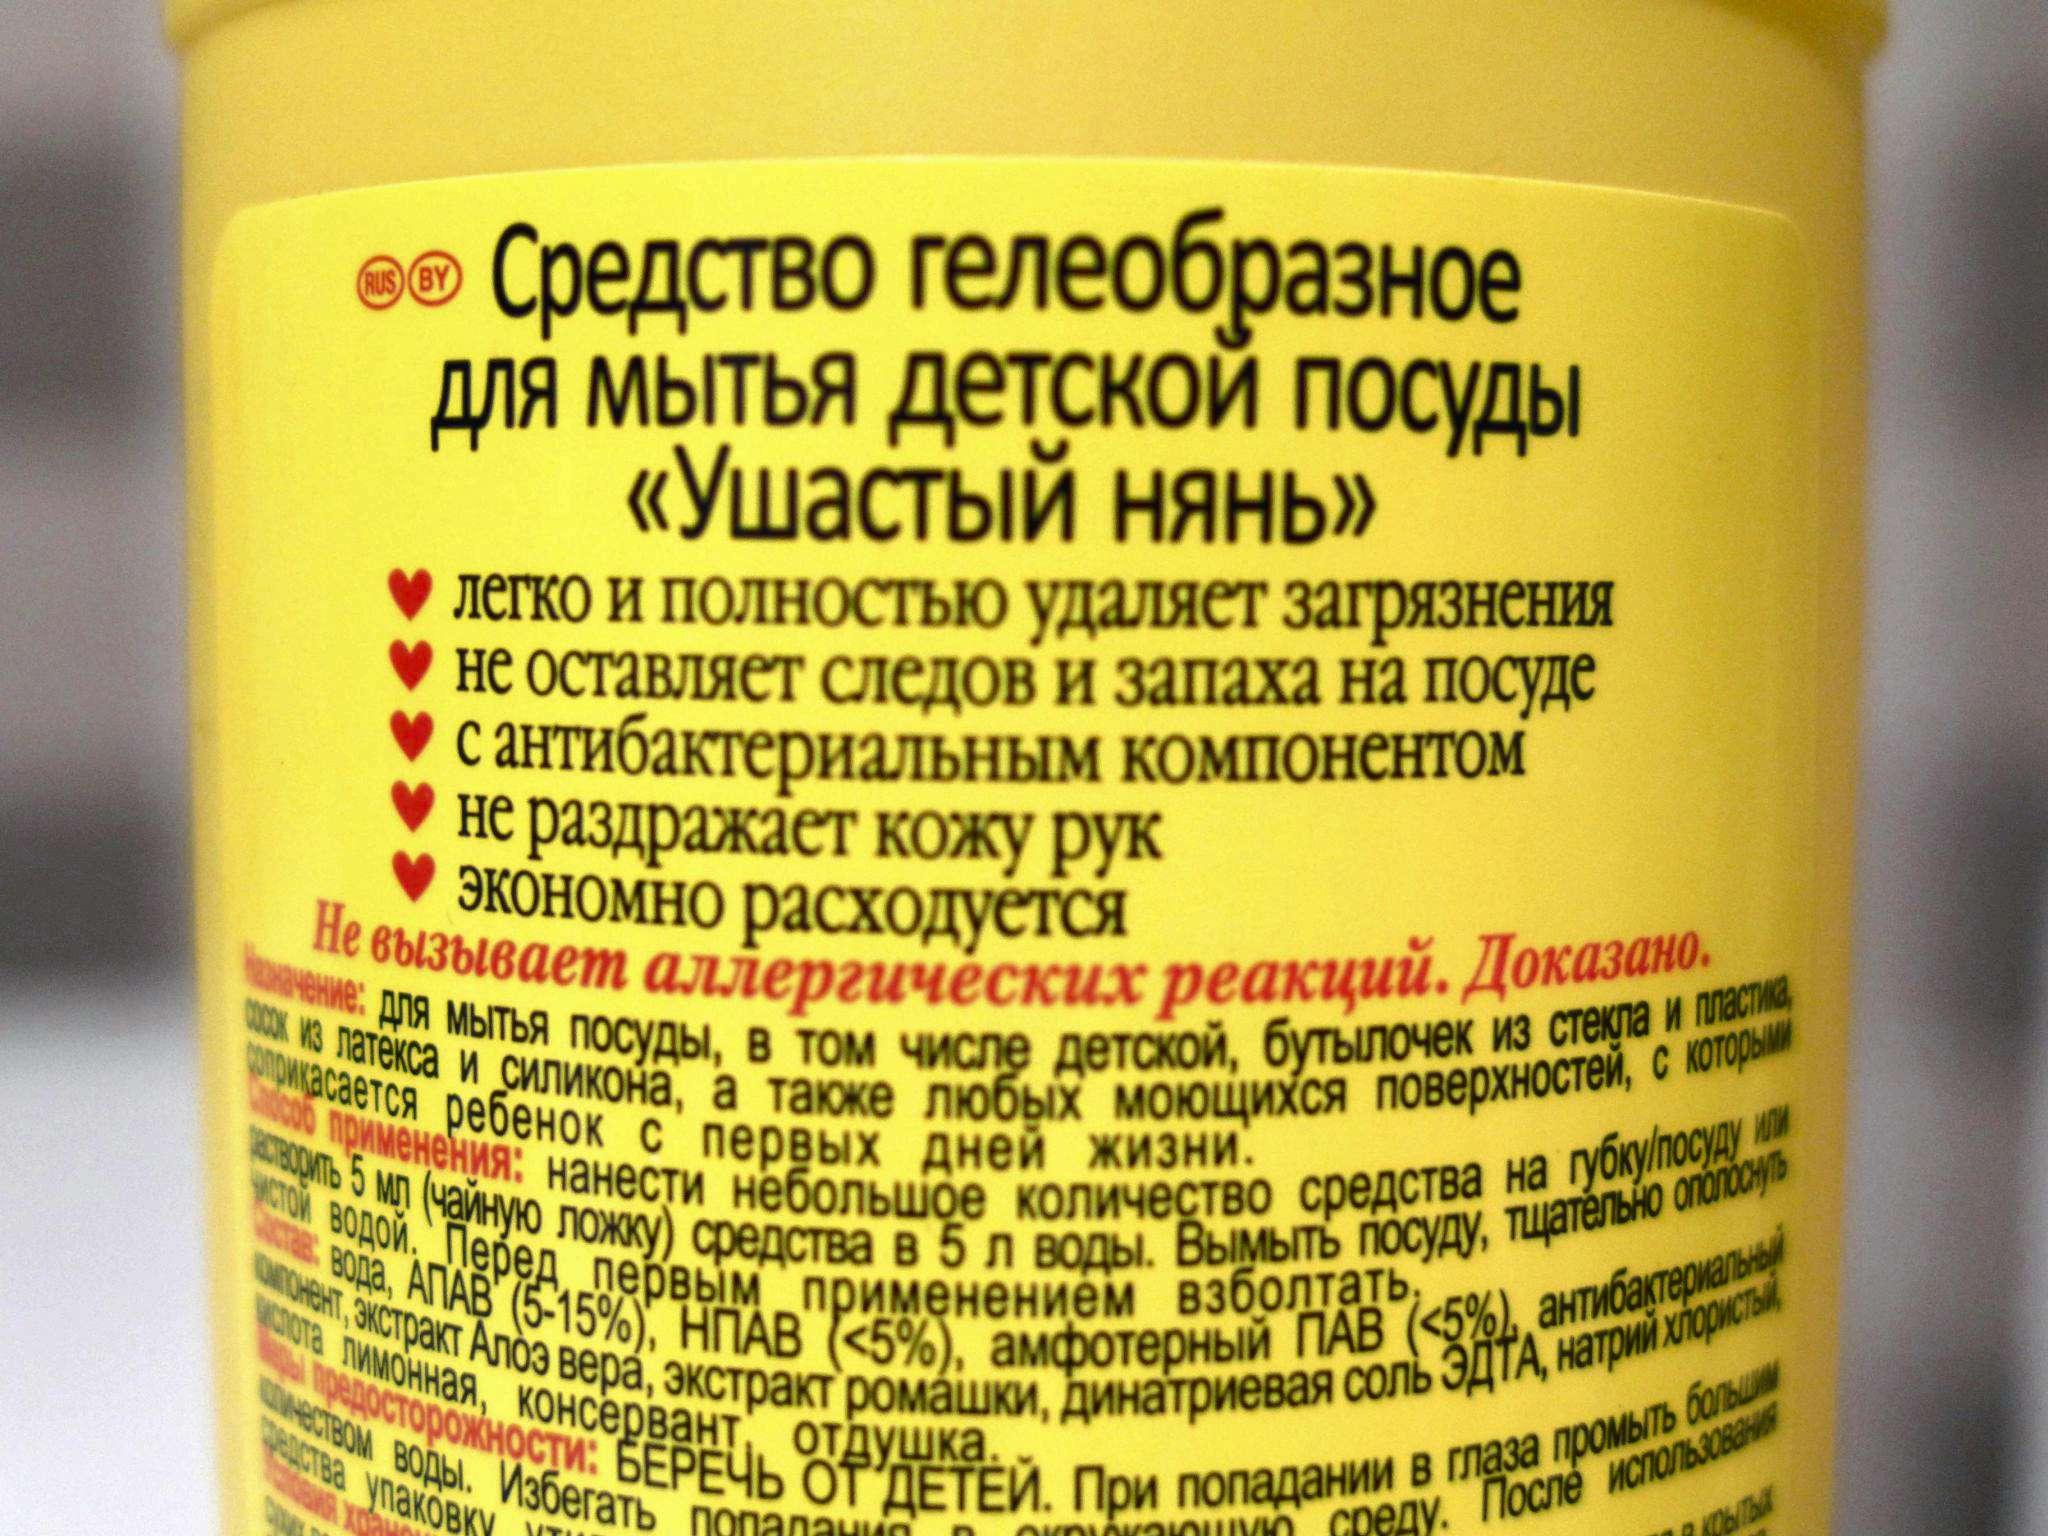 Spice Продажа Таганрог Соли Цена  Архангельск